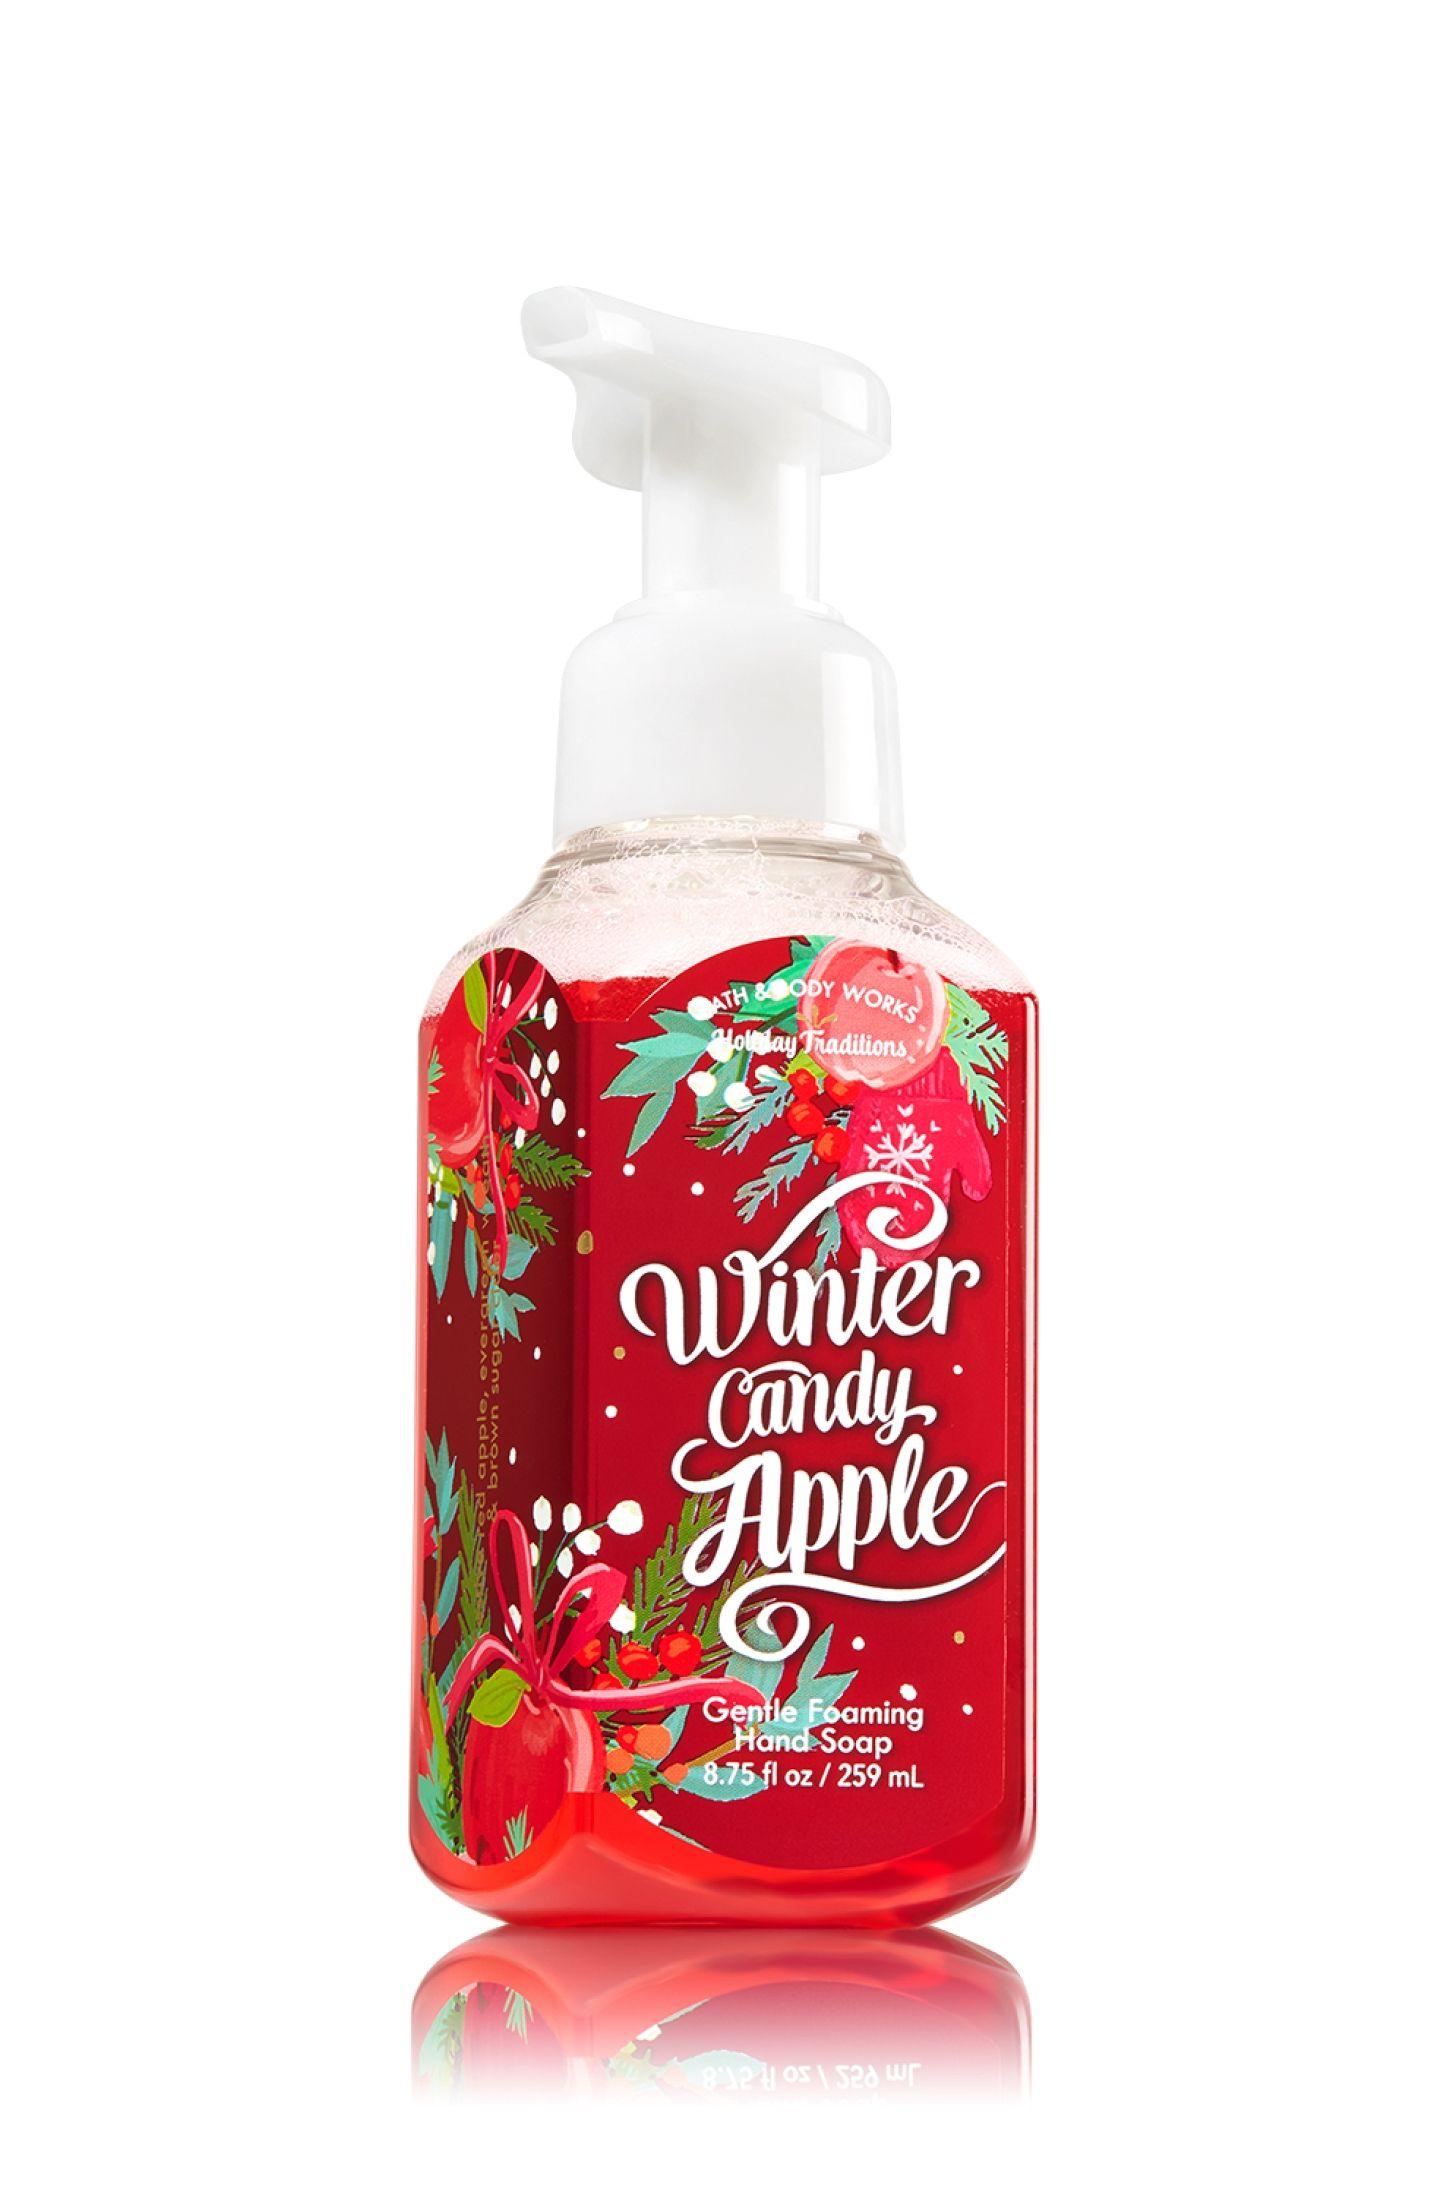 Orchard Apple Pocketbac Sanitizing Hand Gel Soap Sanitizer